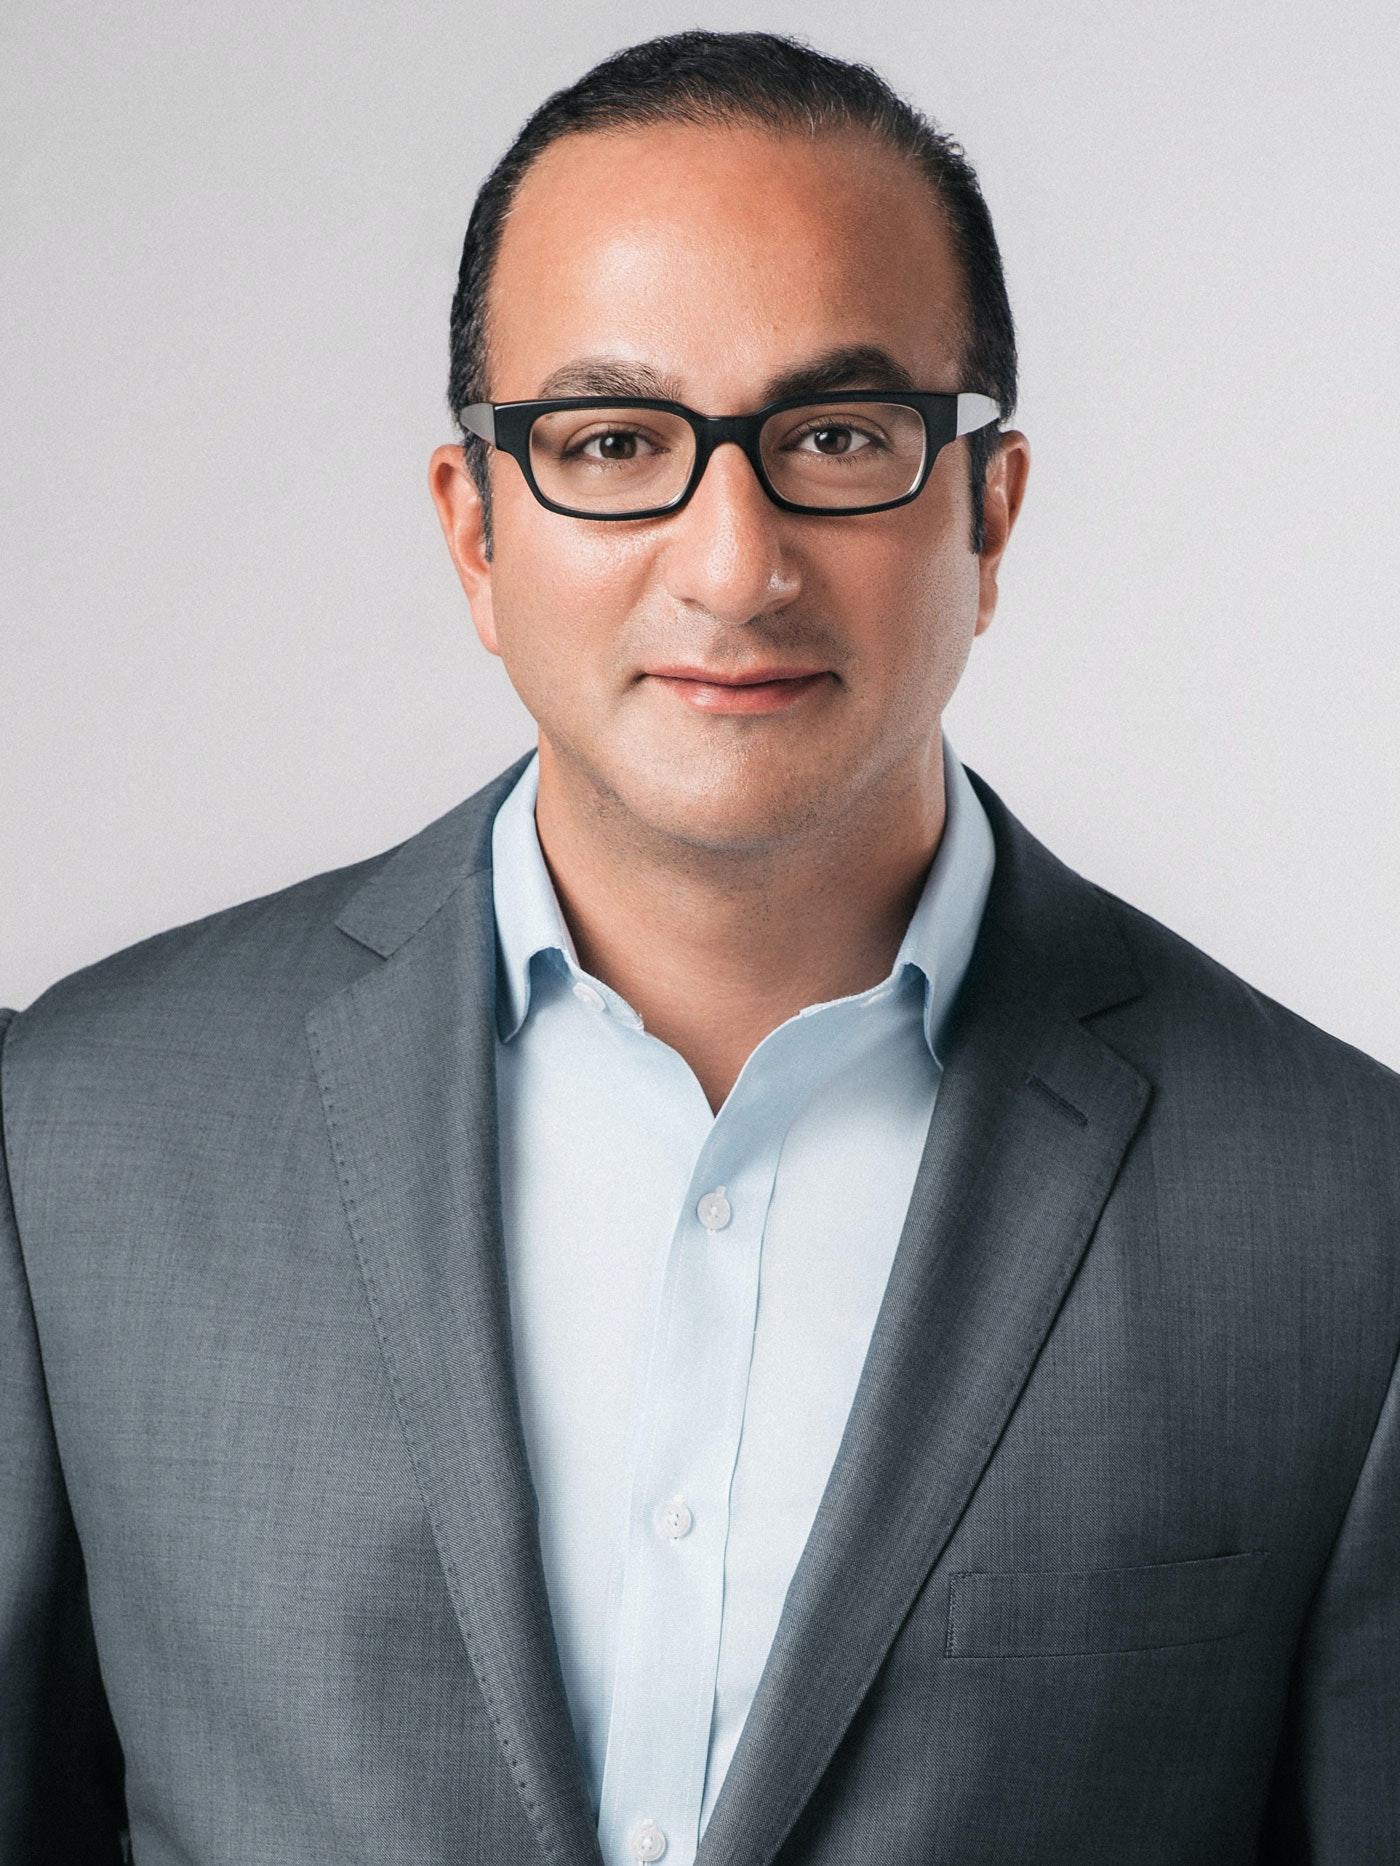 Dr. Arash Akhavan